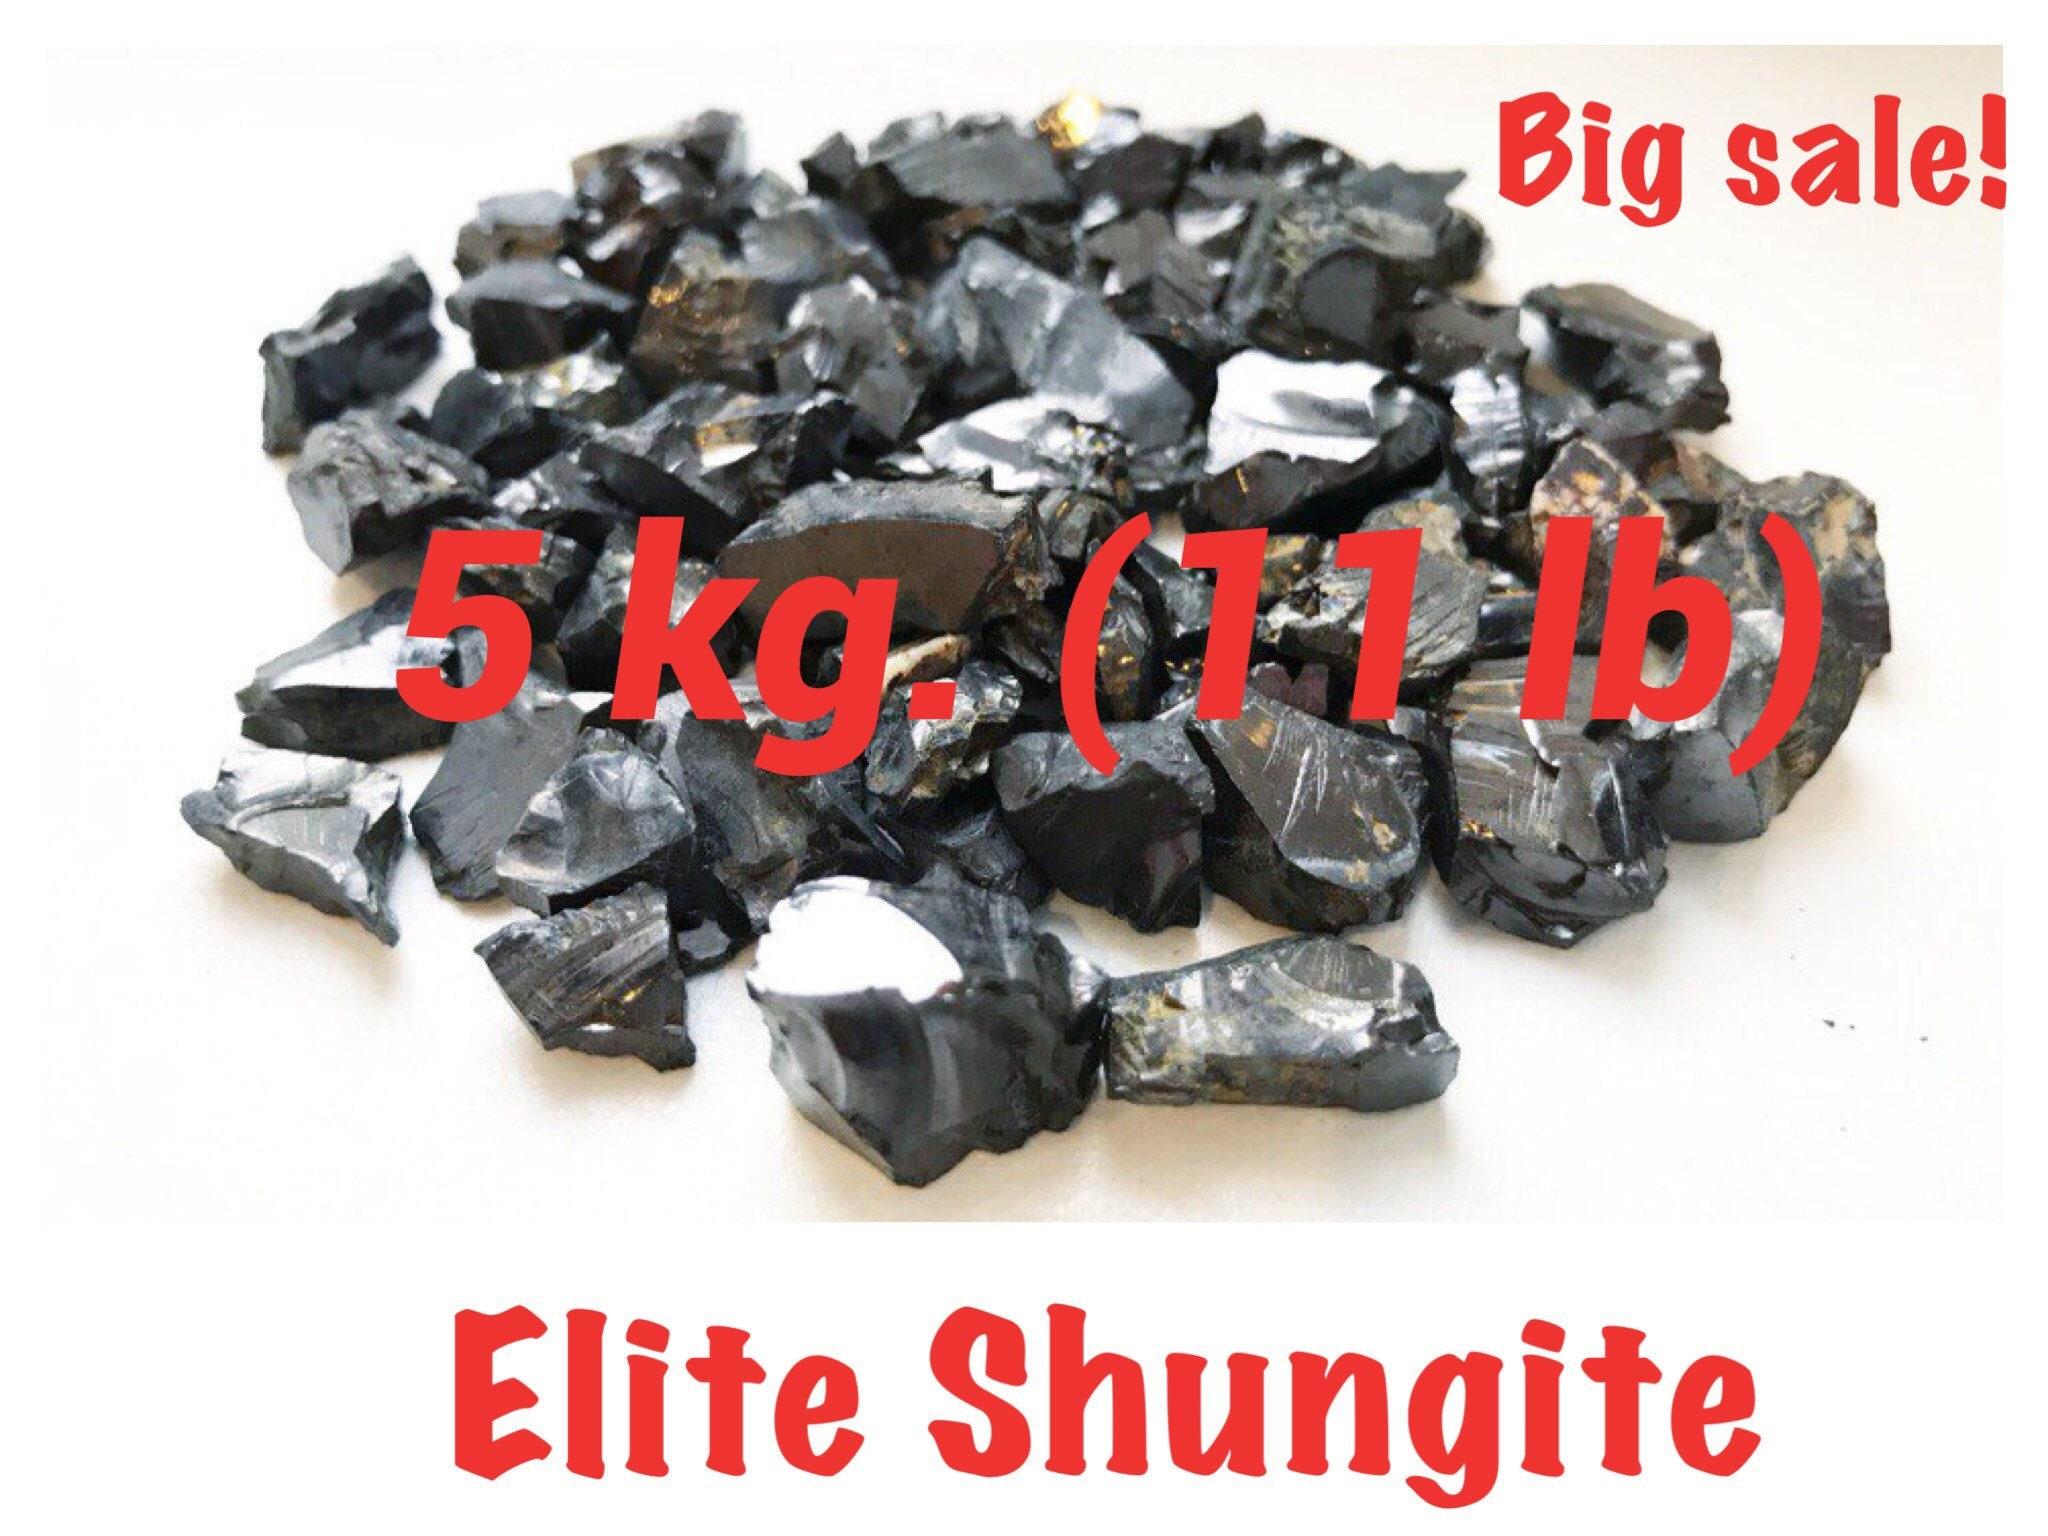 Shungite Elite 5 kg , 5-20 mm  each stones, EMF protection purification  shungite water, detoxification stone gemstones collection